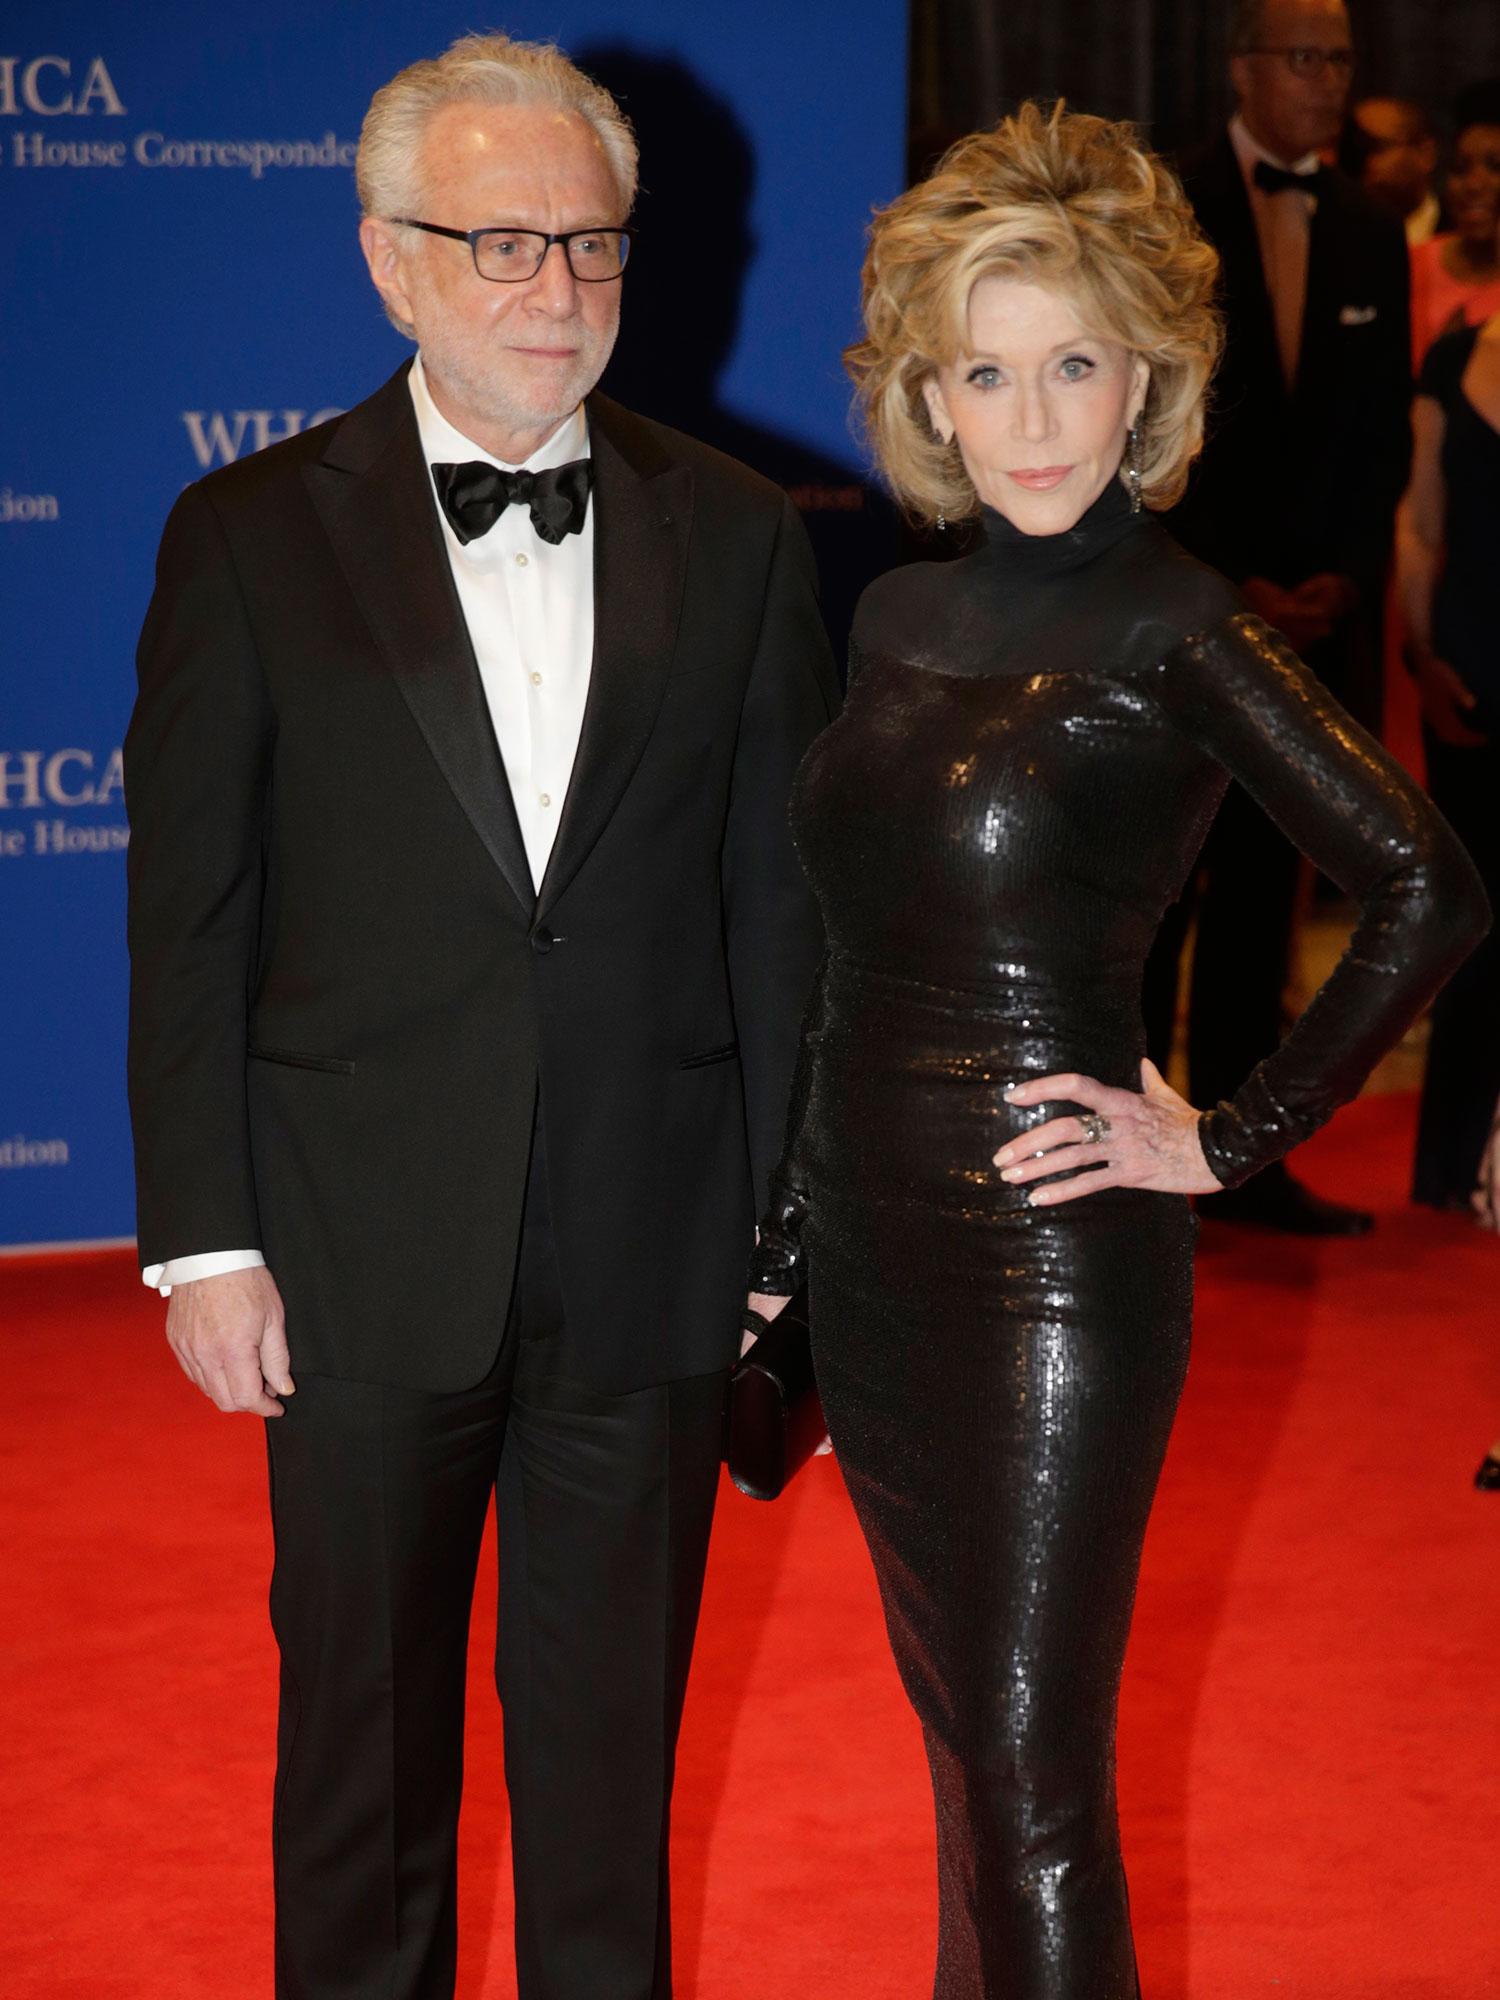 Wolf Blitzer and Jane Fonda